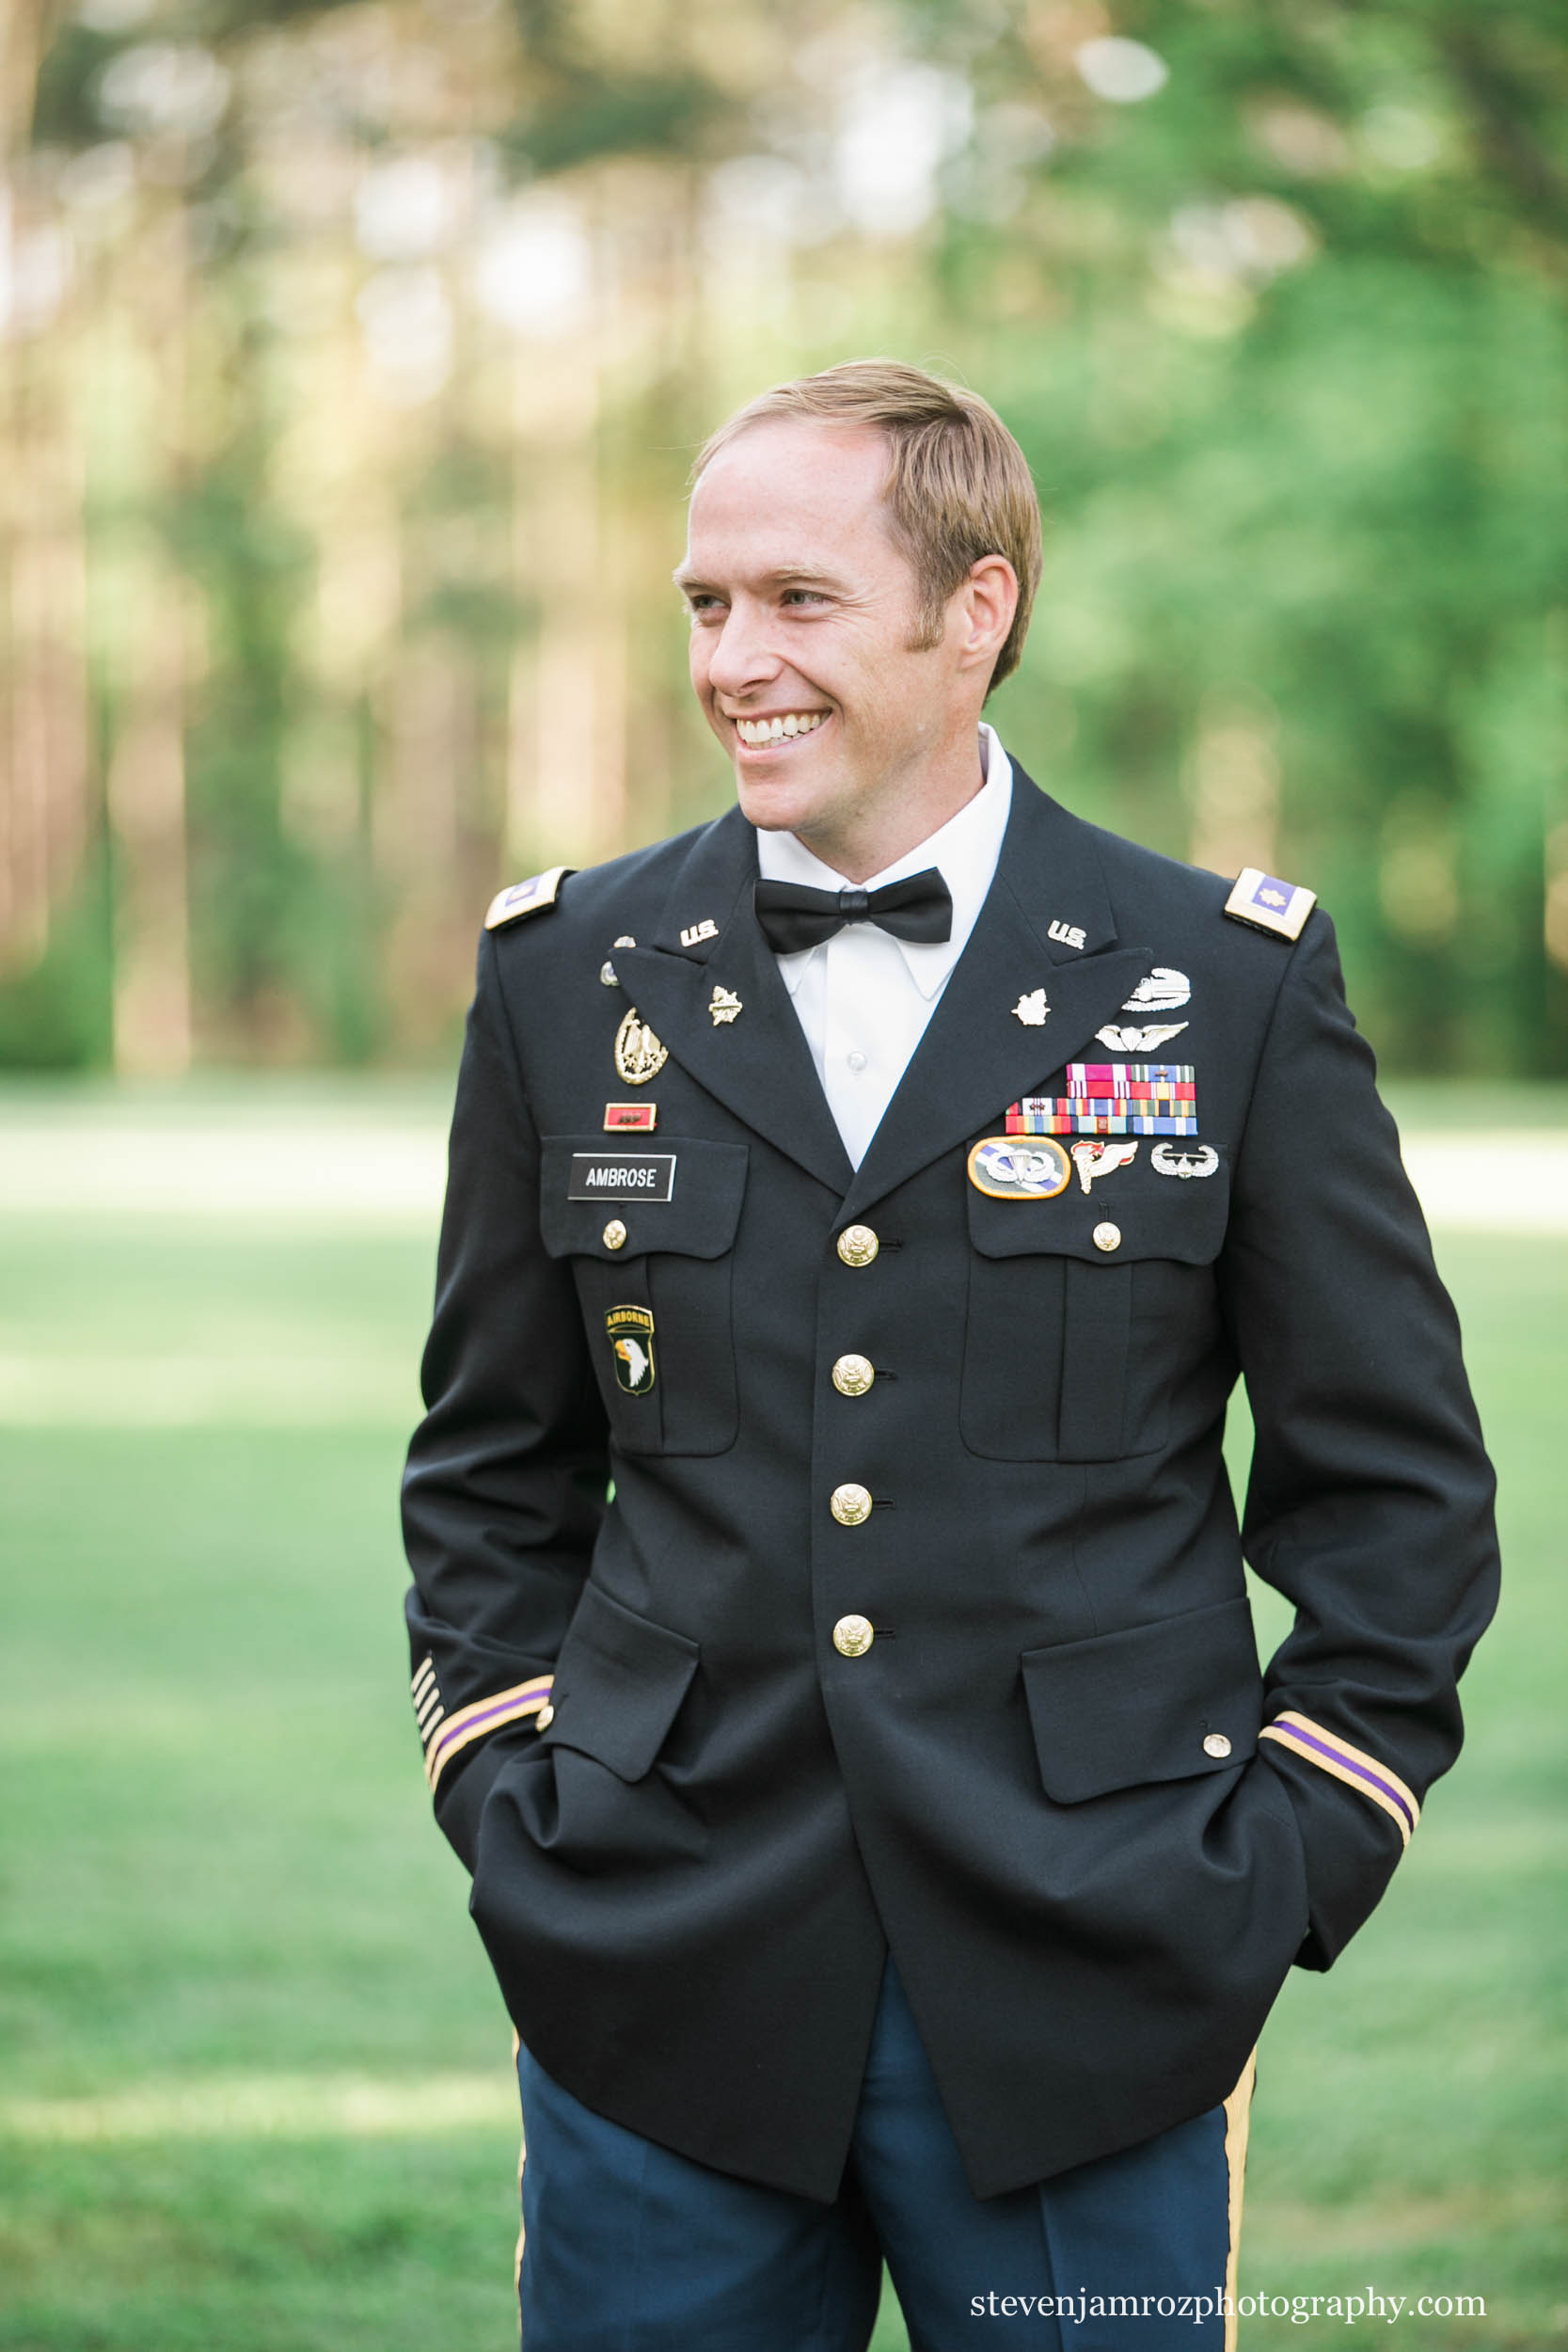 photographers-military-officer-wedding-raleigh-steven-jamroz-photography-0080.jpg